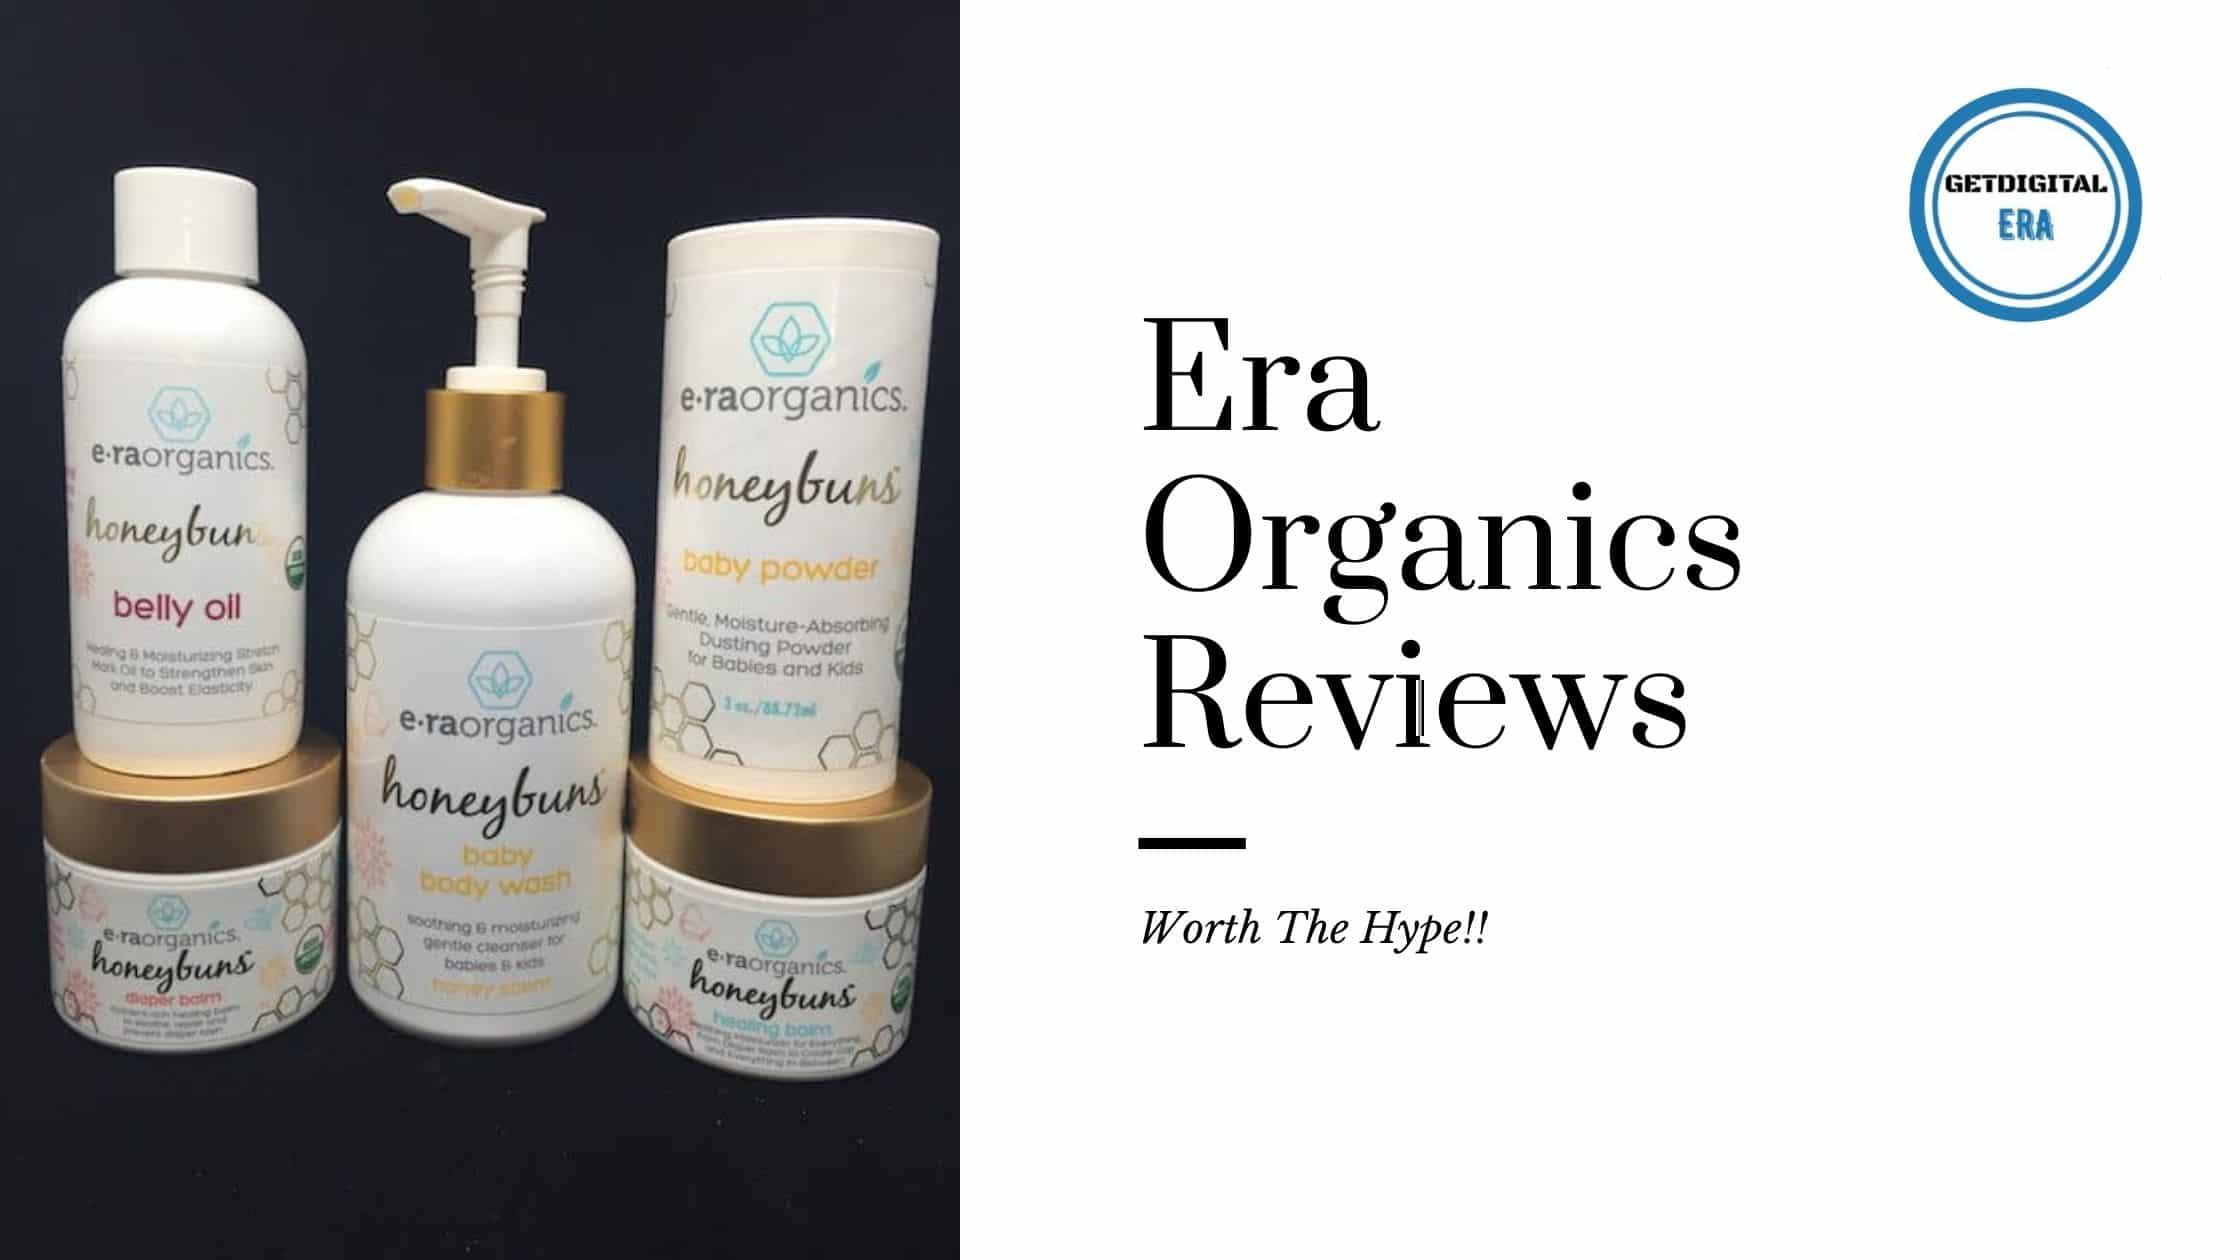 Era Organics Reviews